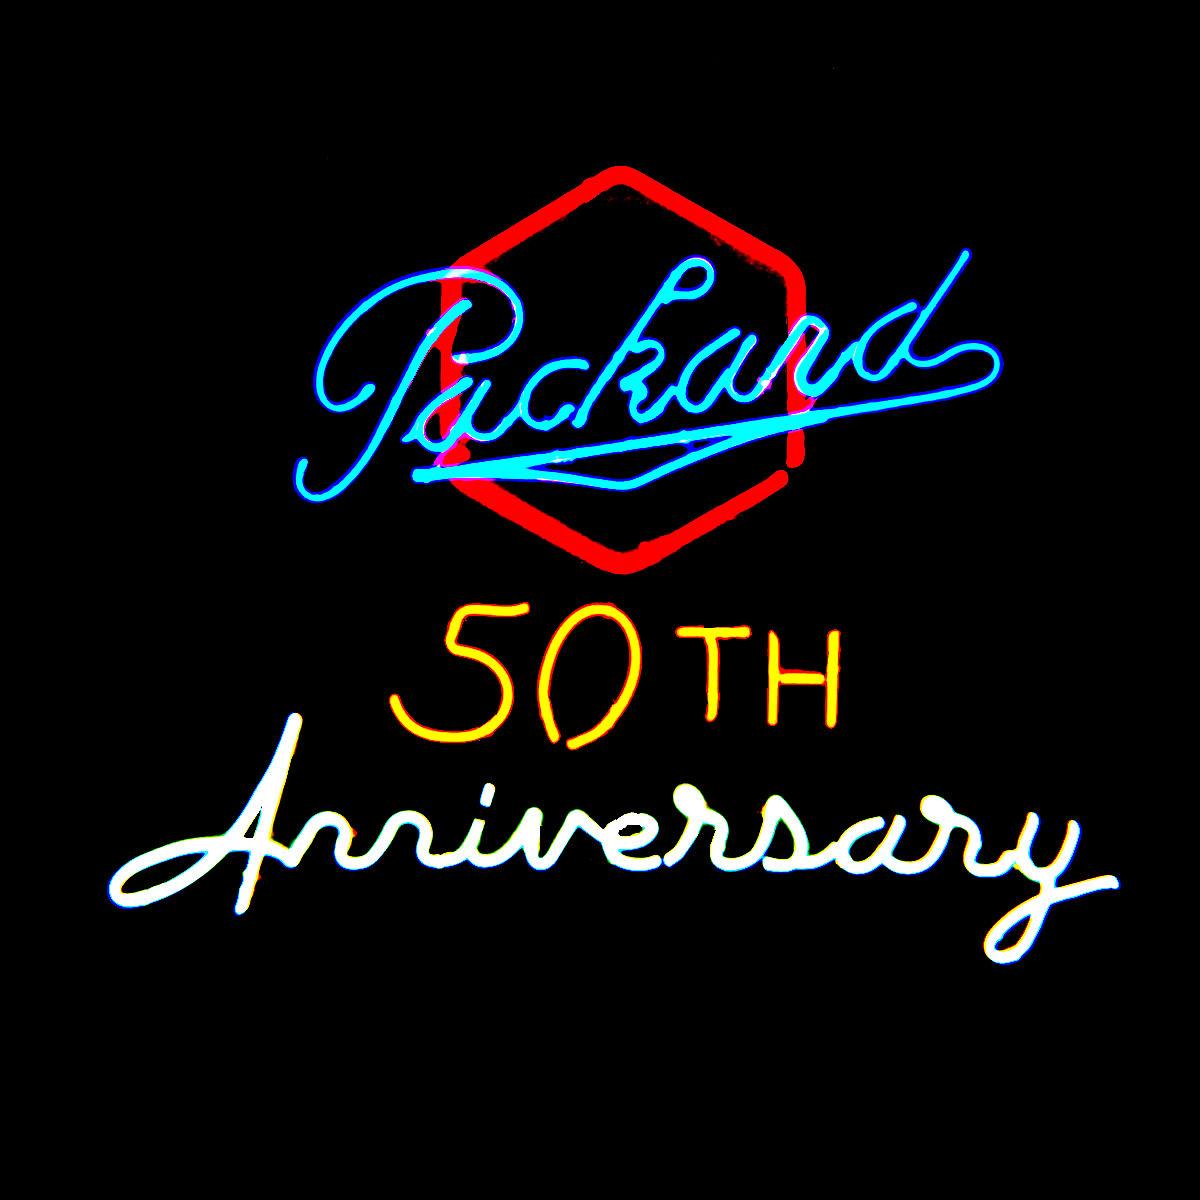 """Packard 50th Anniversary"" Dealership Neon Sign by John Barton - former Packard New Car Dealer"